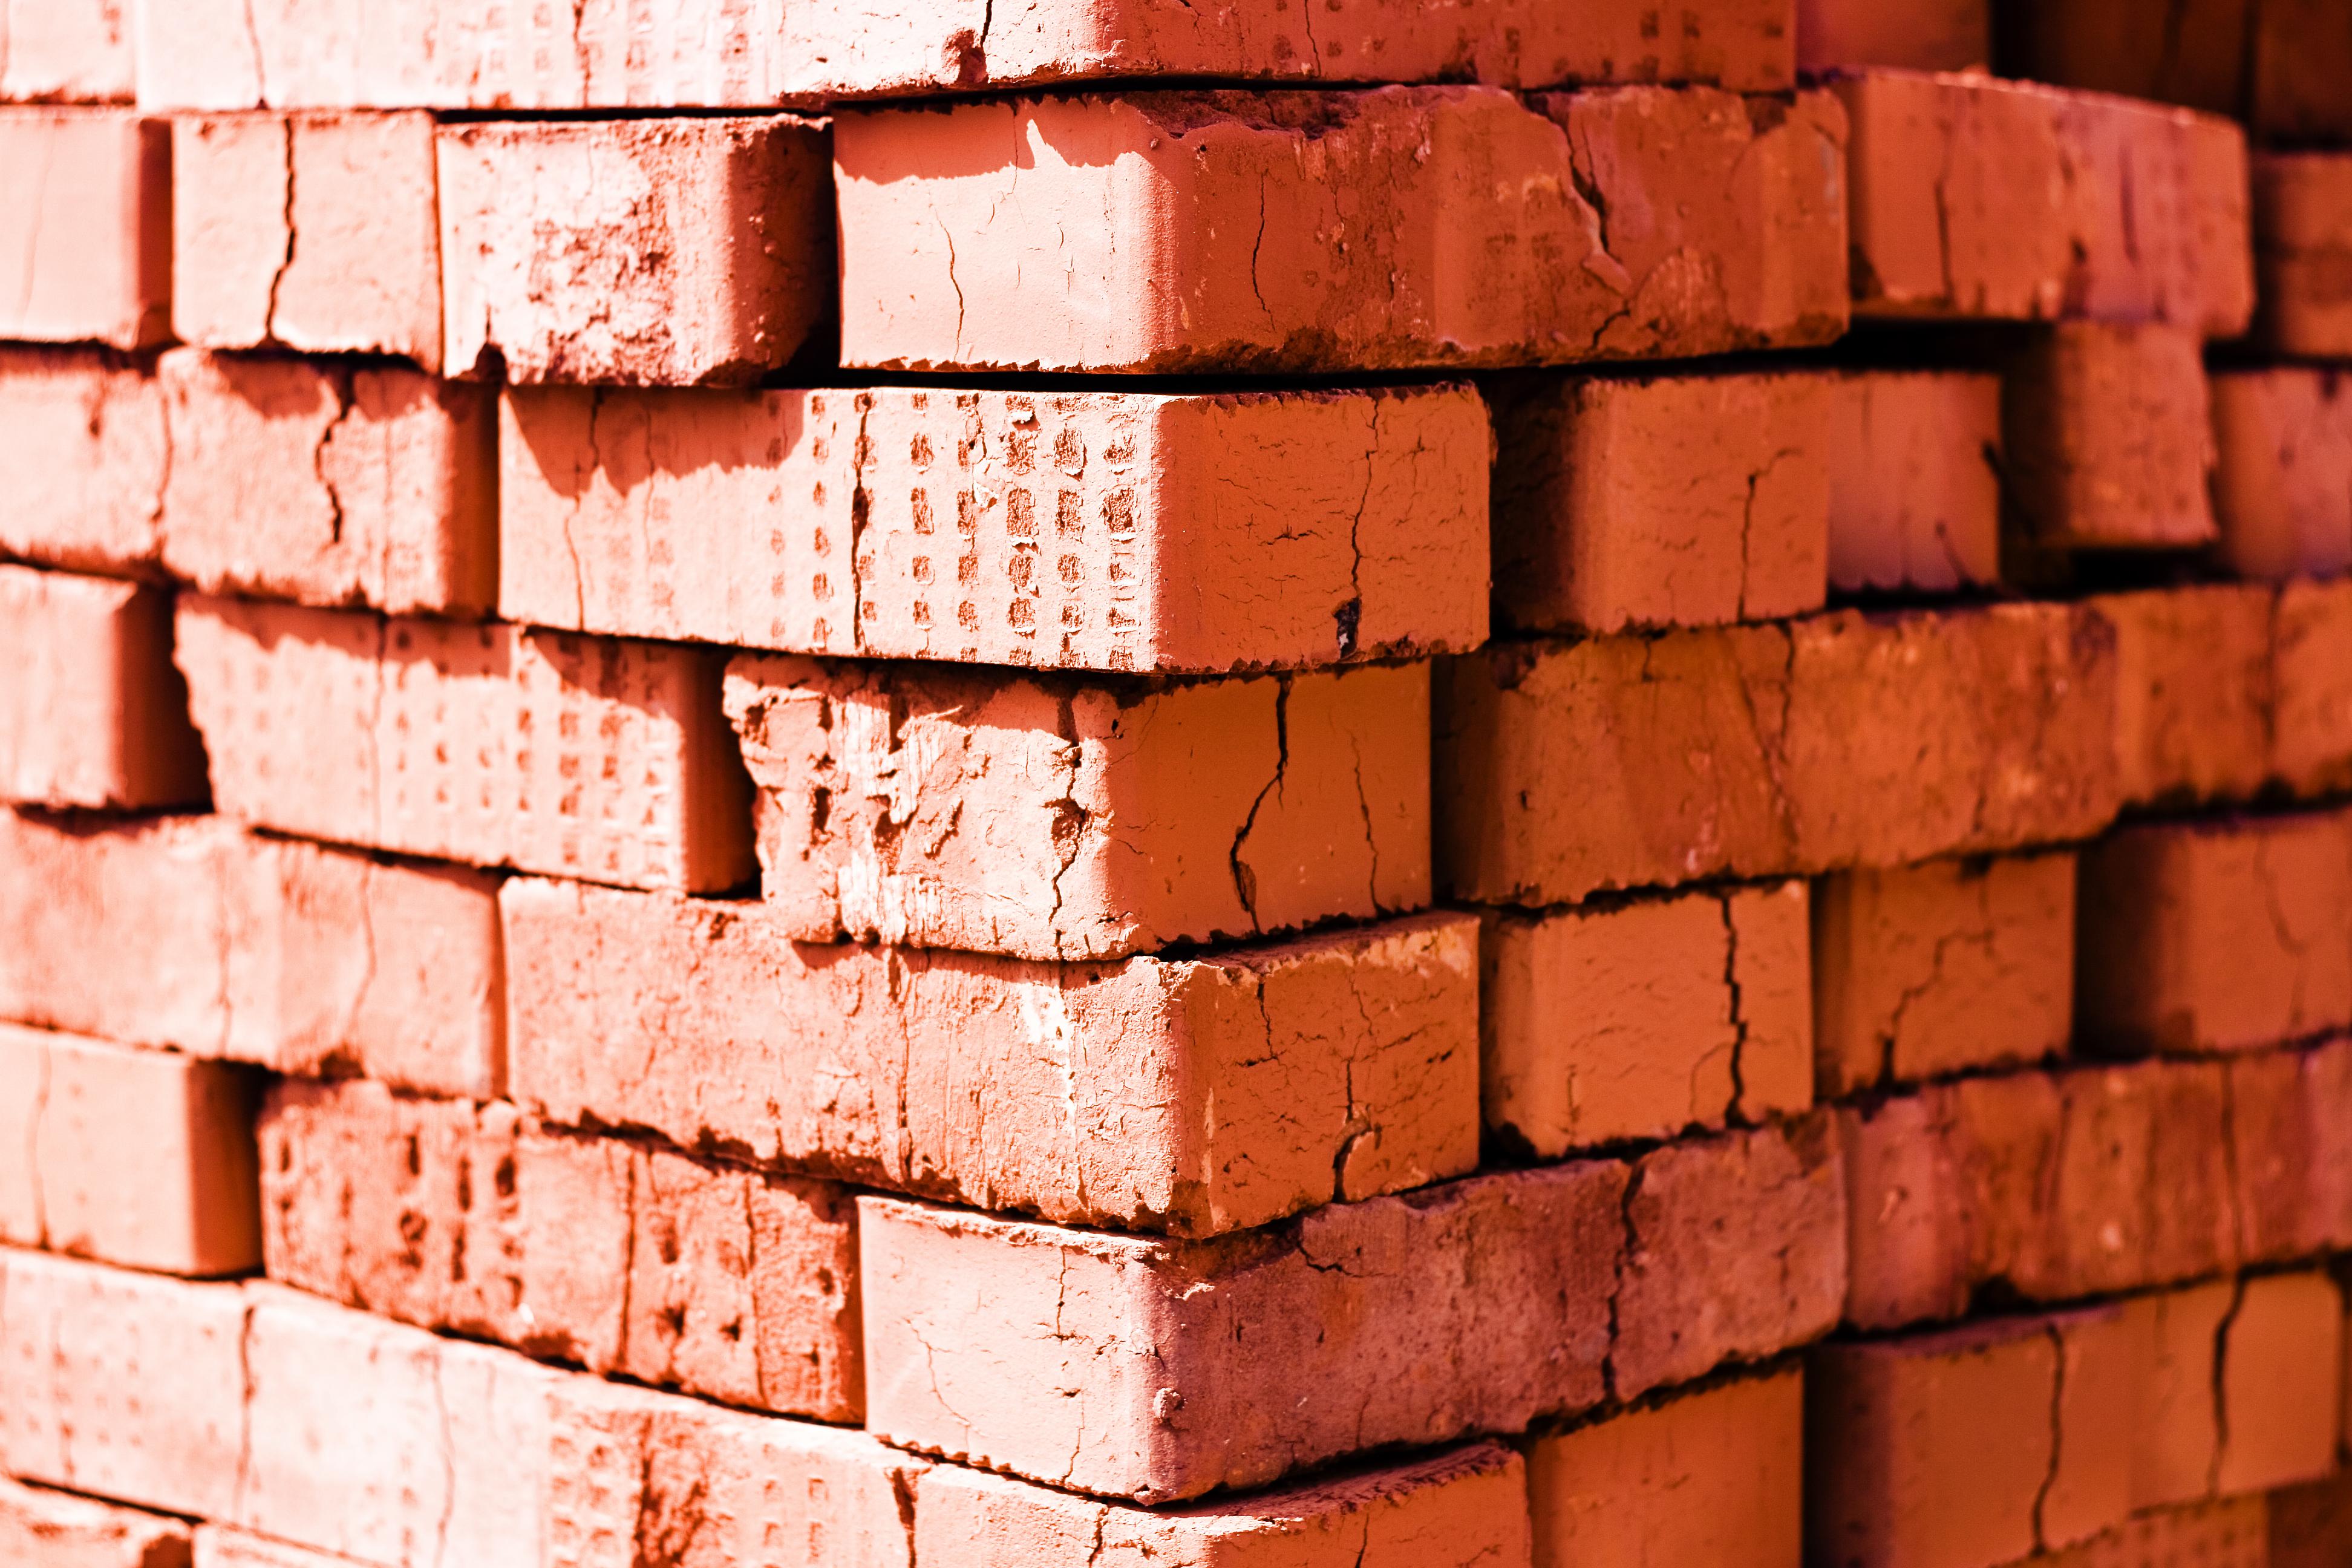 bricks, Backgrounds, Blocks, Blotch, Brickwall, HQ Photo